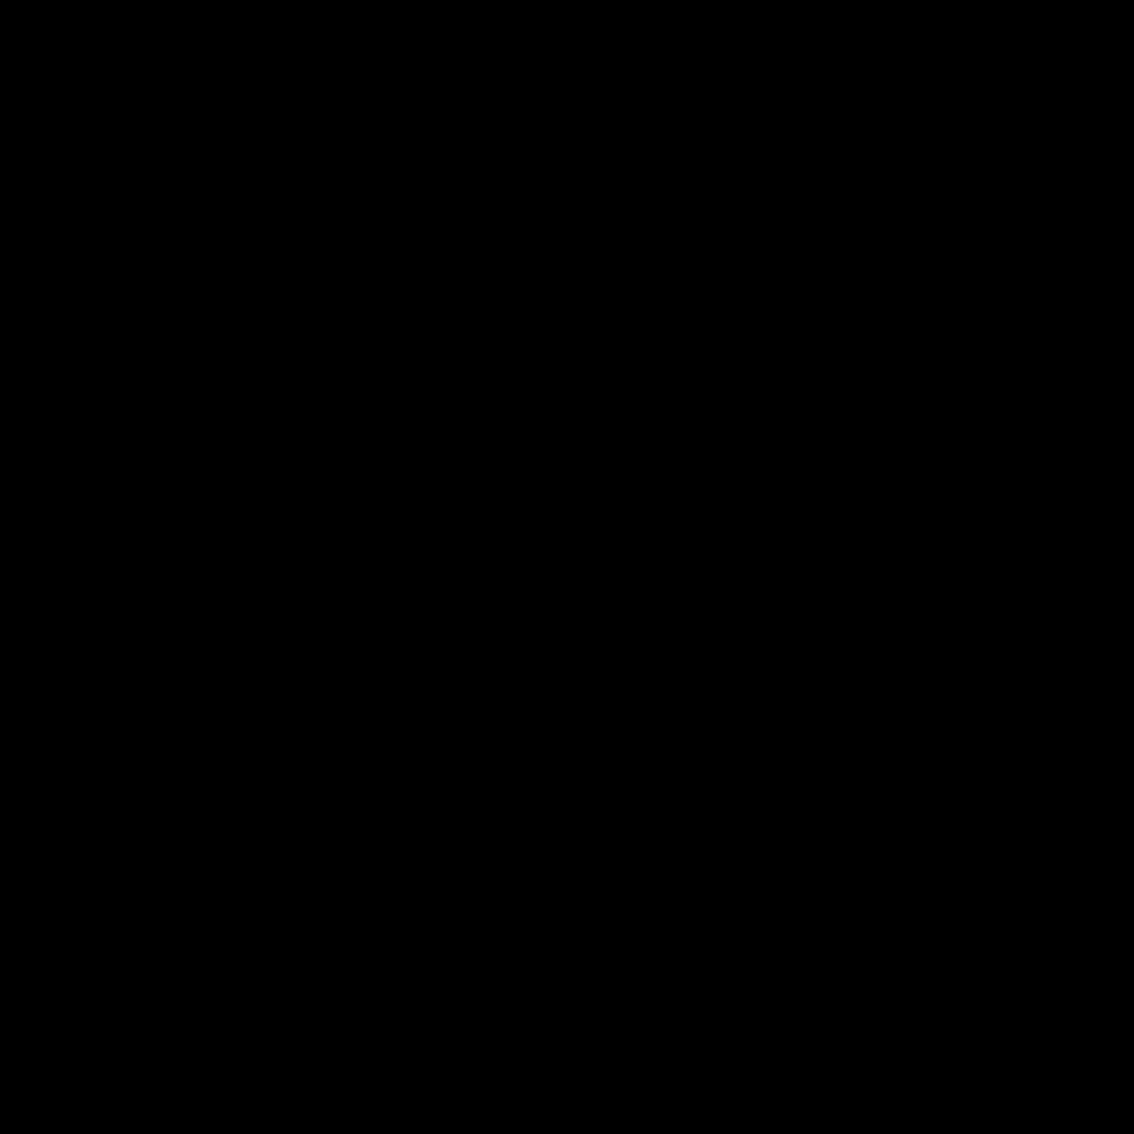 groove logooo.png